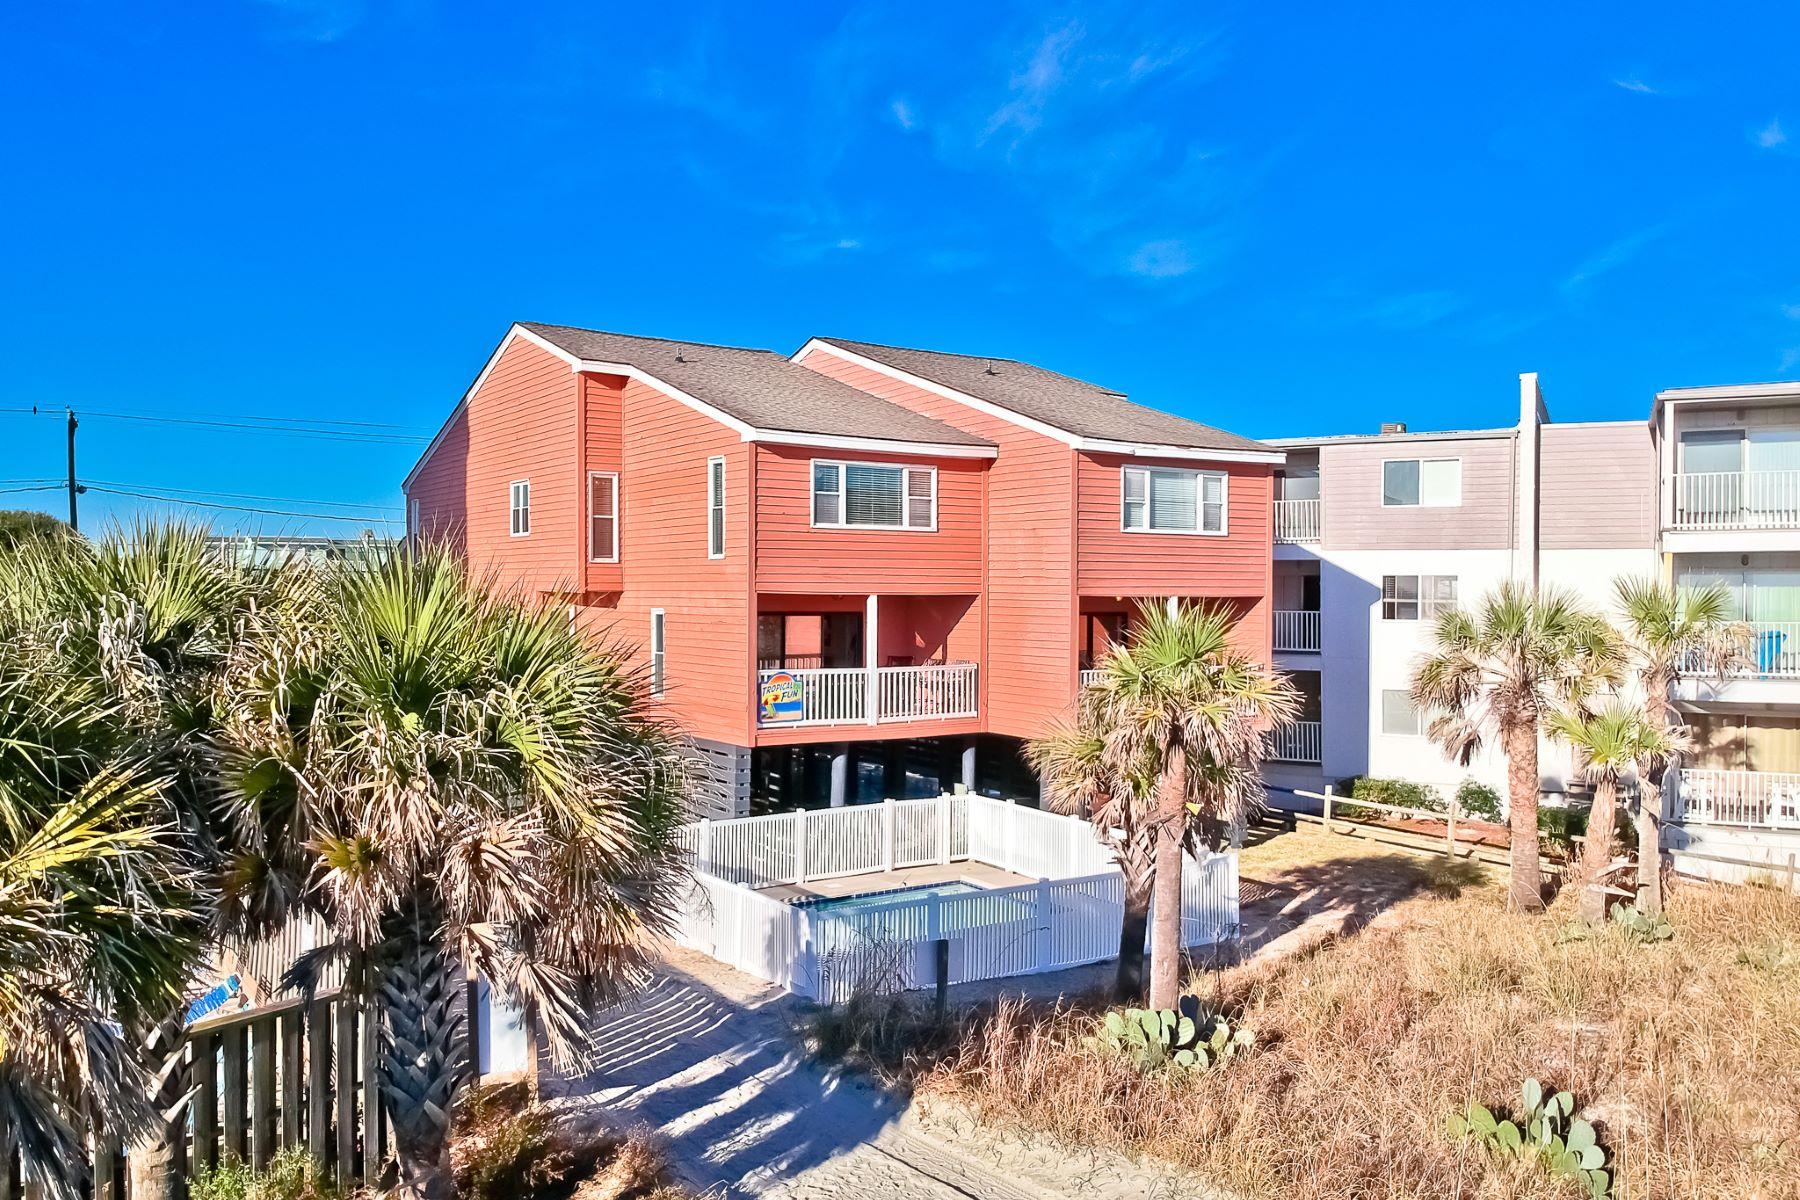 Duplex للـ Sale في Oceanfront Investment 6300 N. Ocean Blvd, North Myrtle Beach, South Carolina, 29582 United States